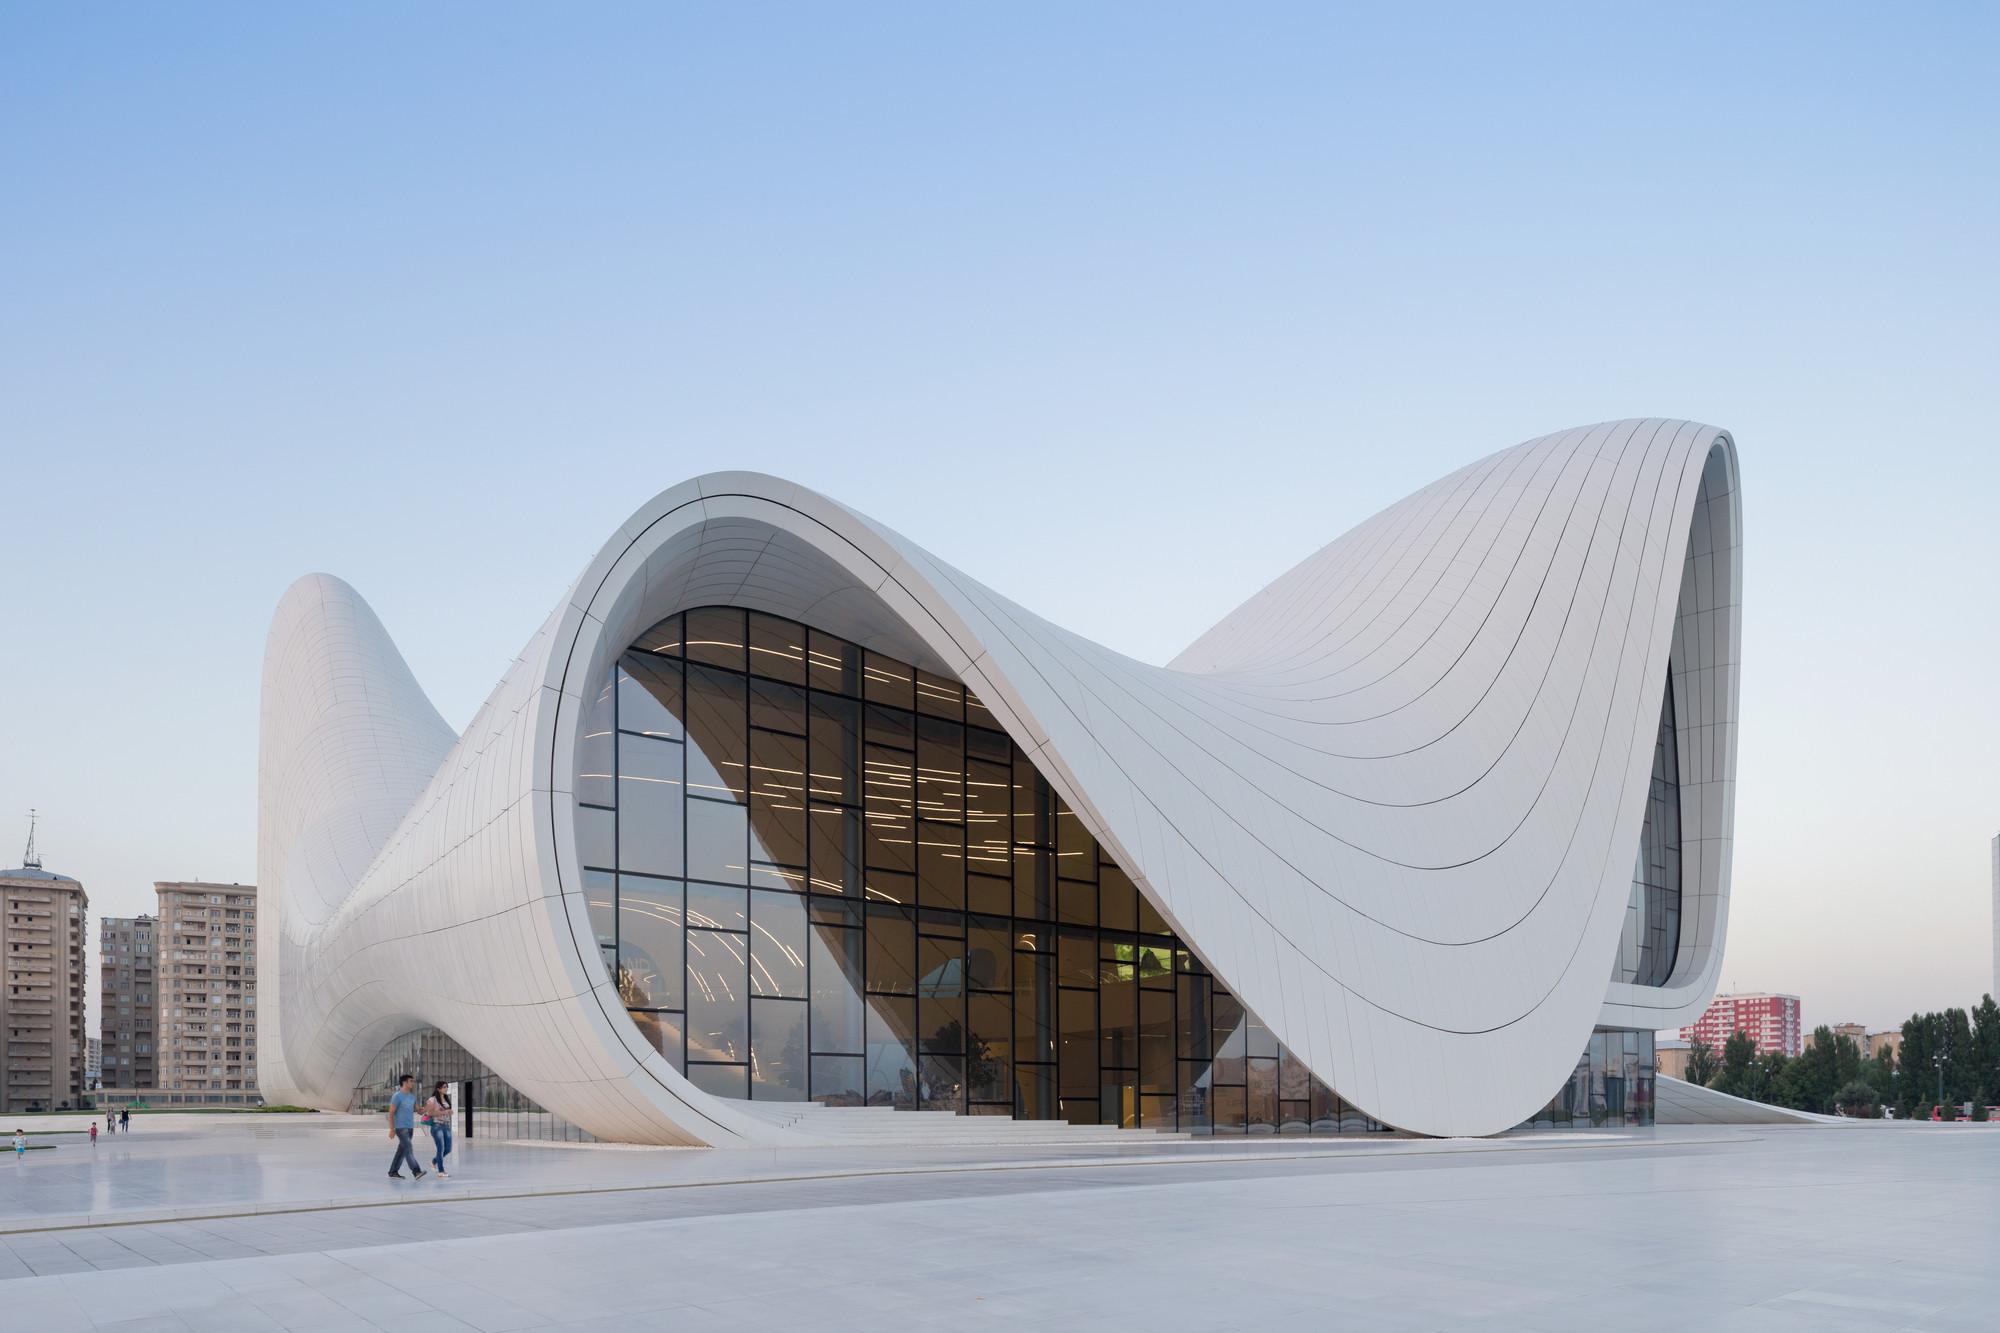 Archivo: Arquitectura Curvilínea, © Iwan Baan